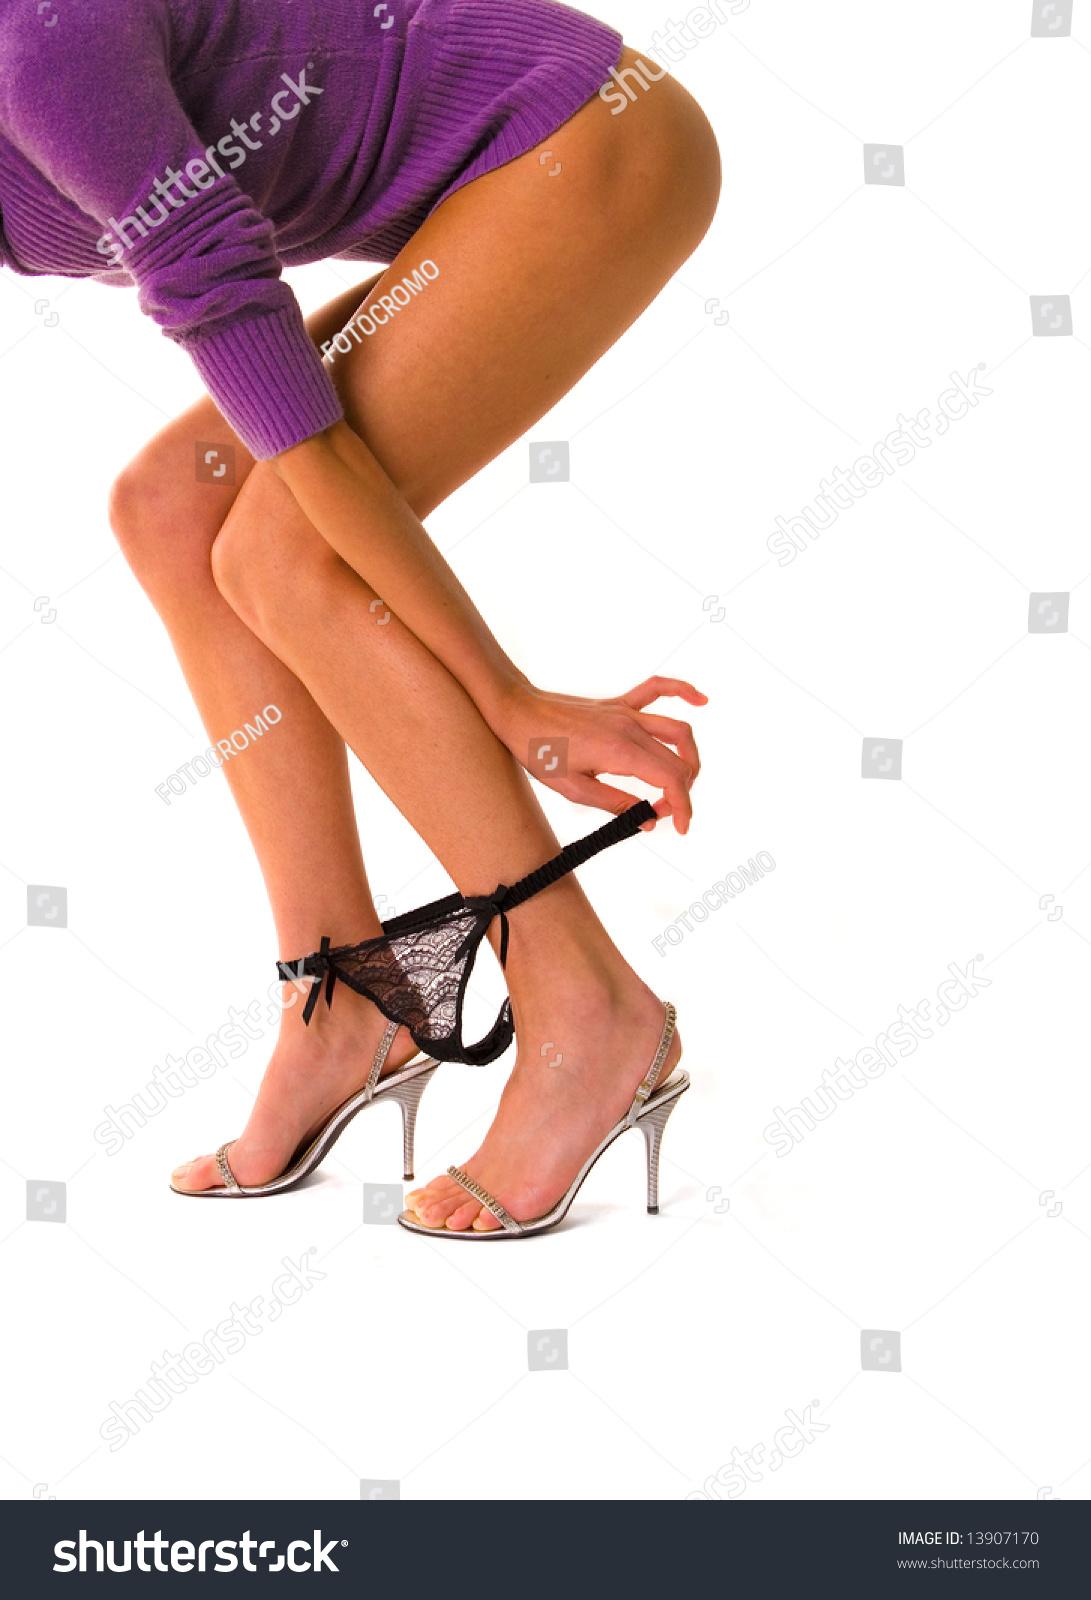 femdom force consumption